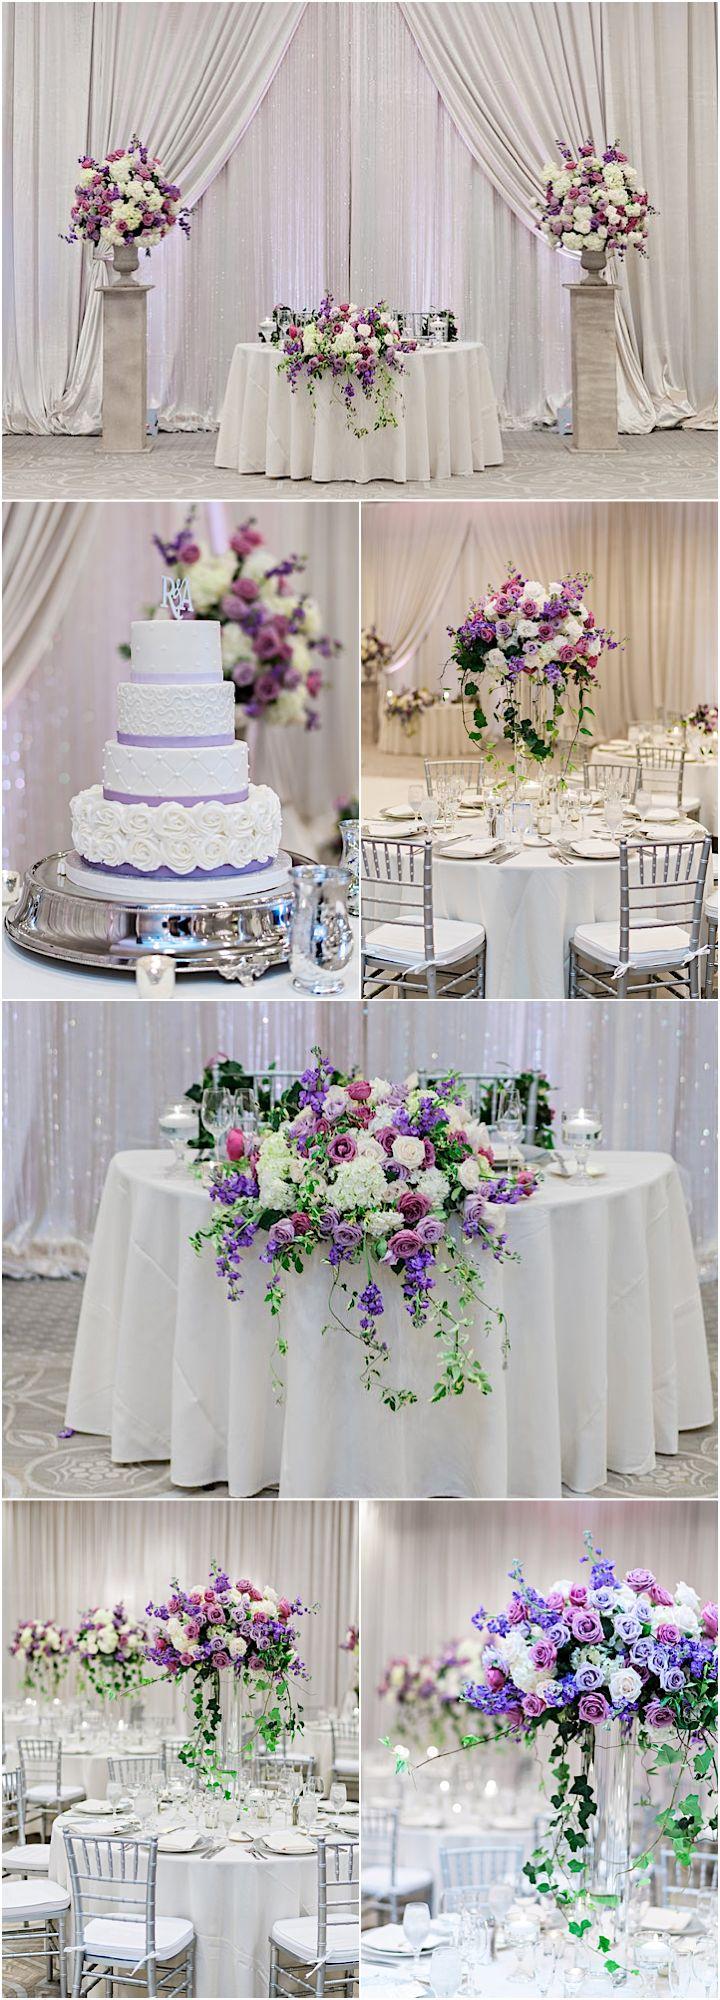 Featured Photographer: Kristen Weaver Photography; gorgeous wedding reception ideas